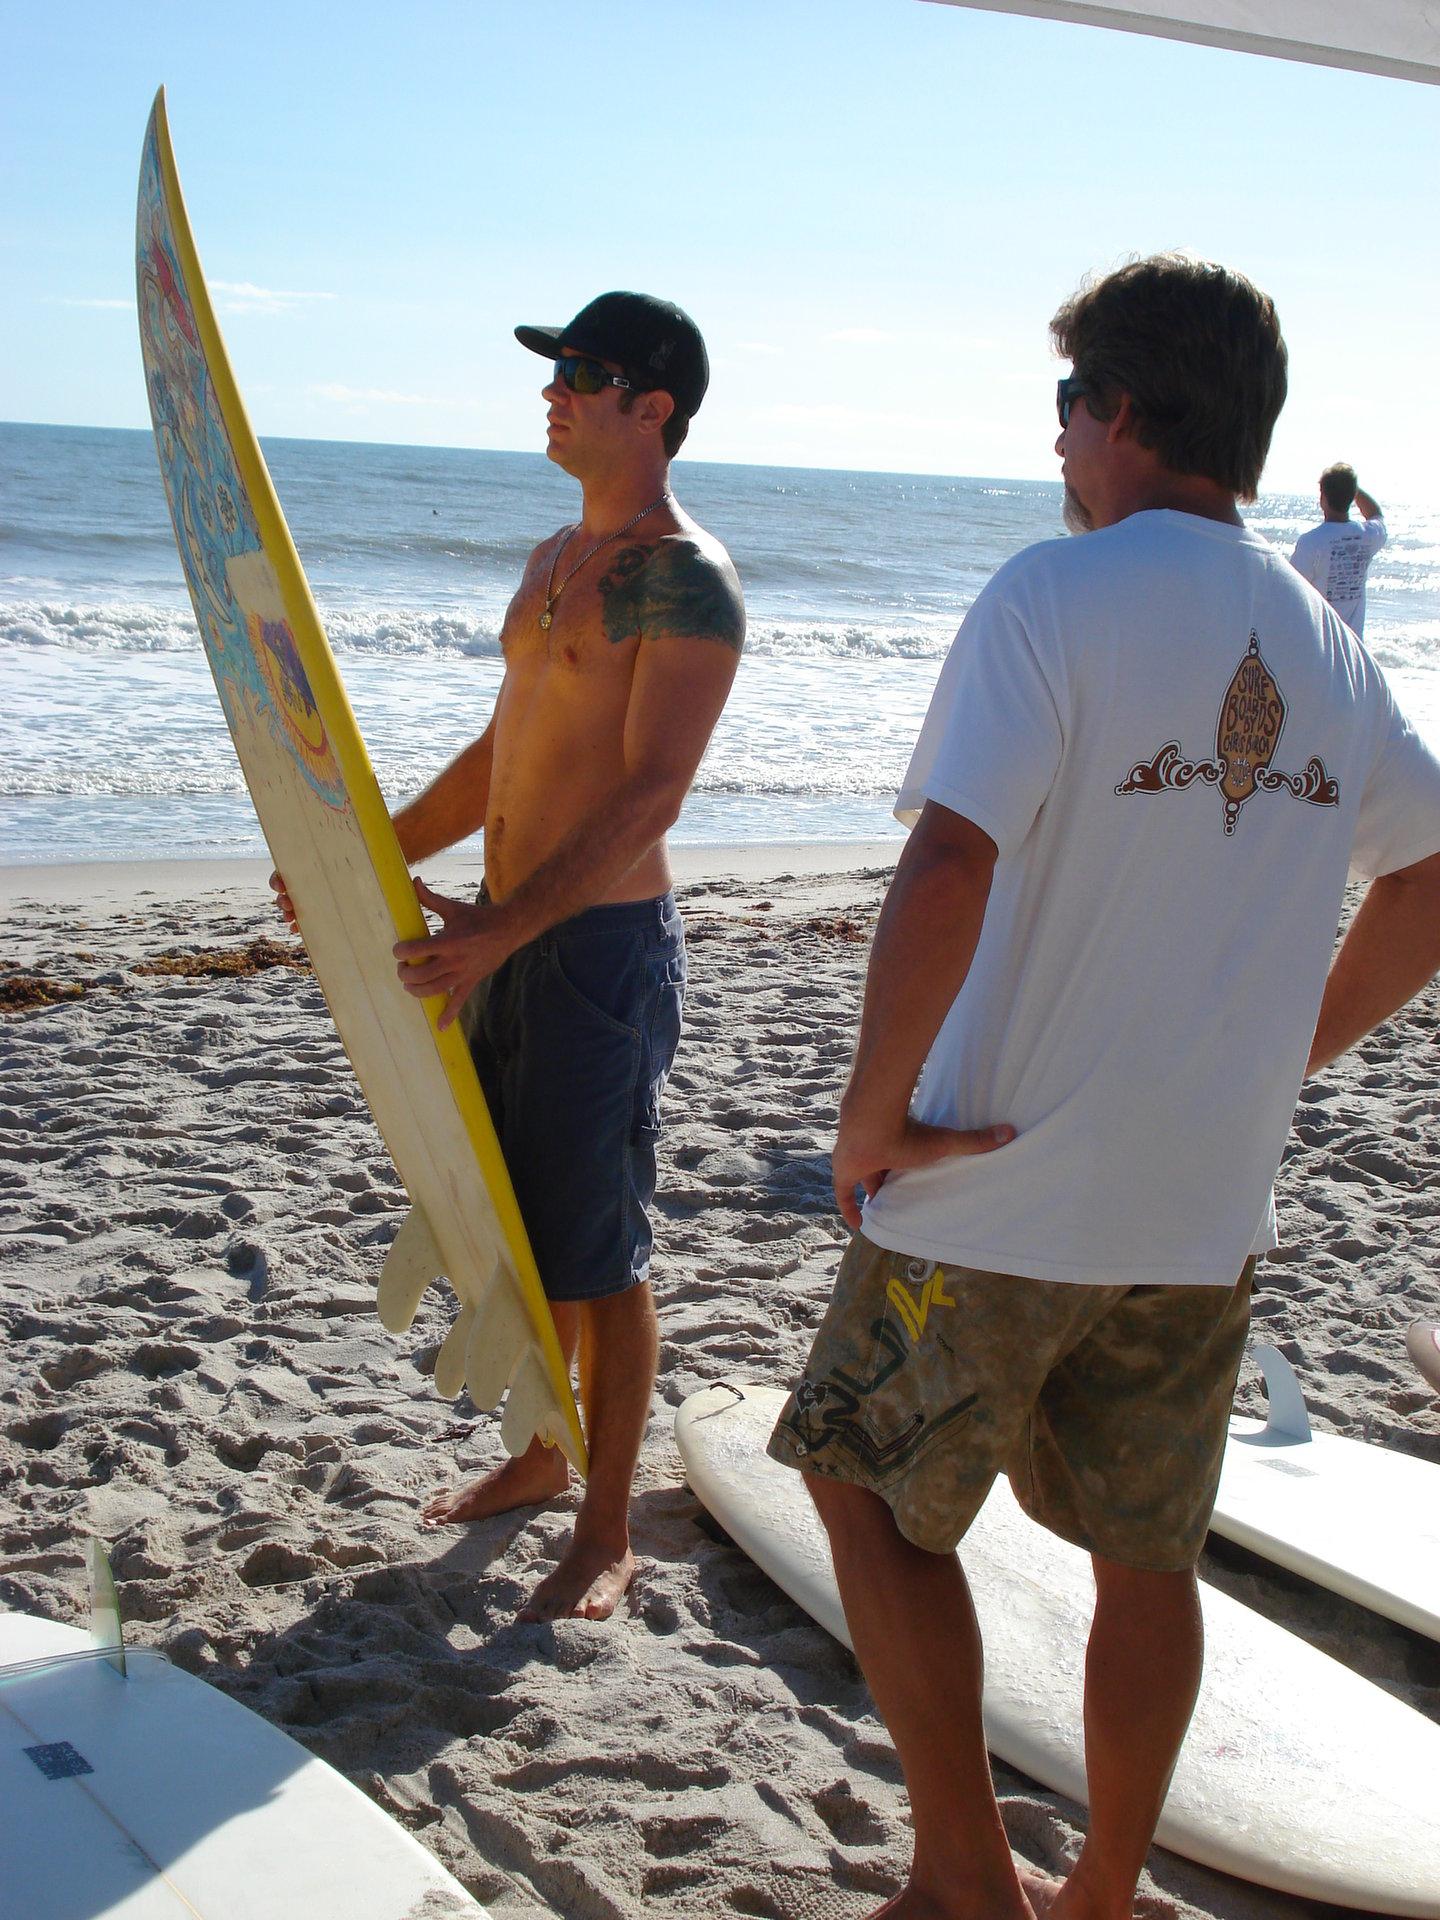 Surfboards By Chris Birch